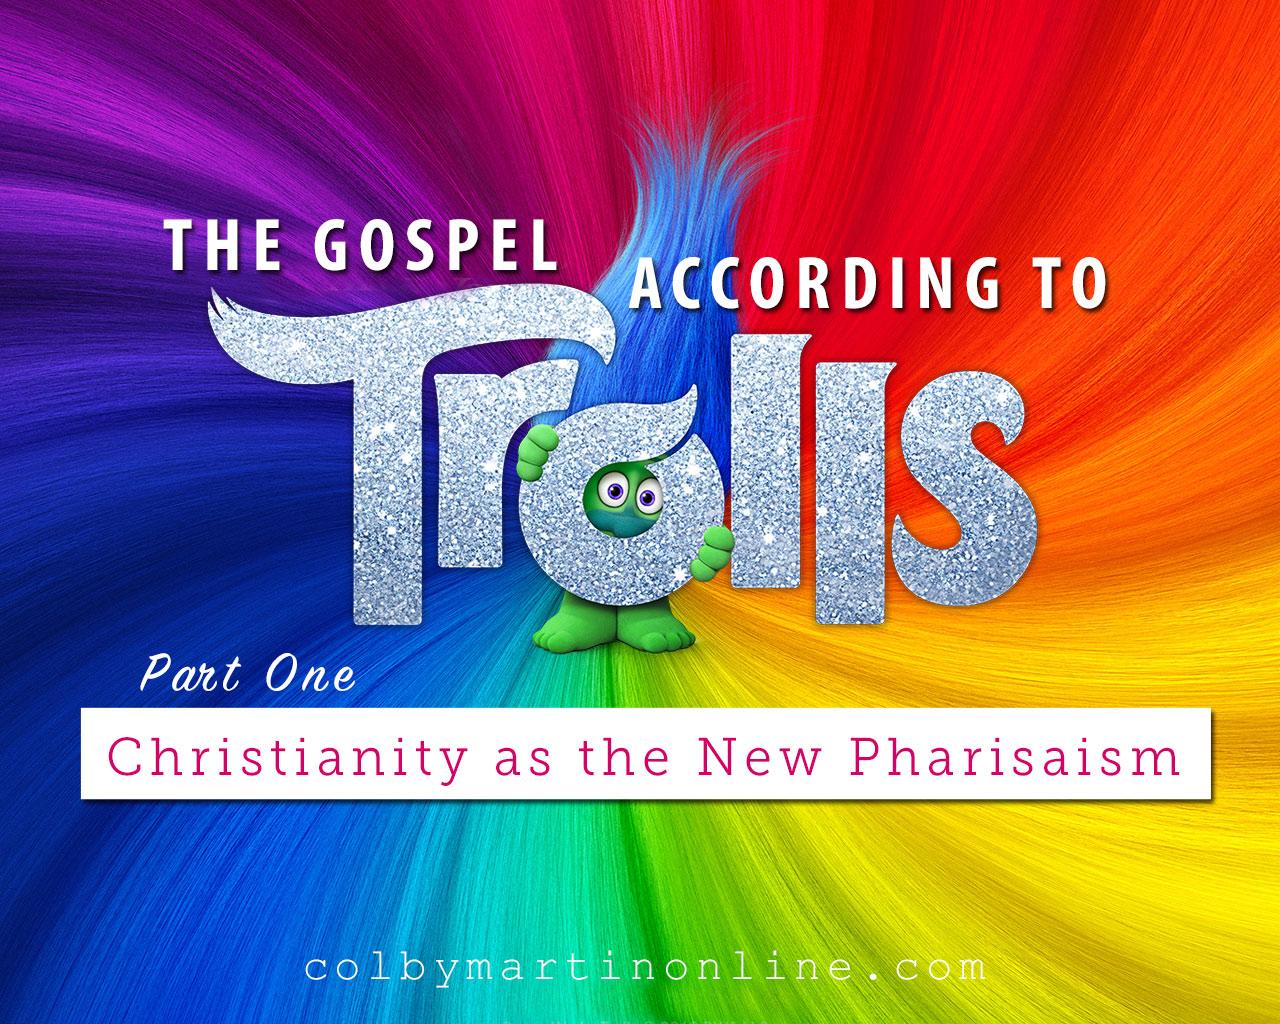 Trolls movie teaches gospel progressive christianity